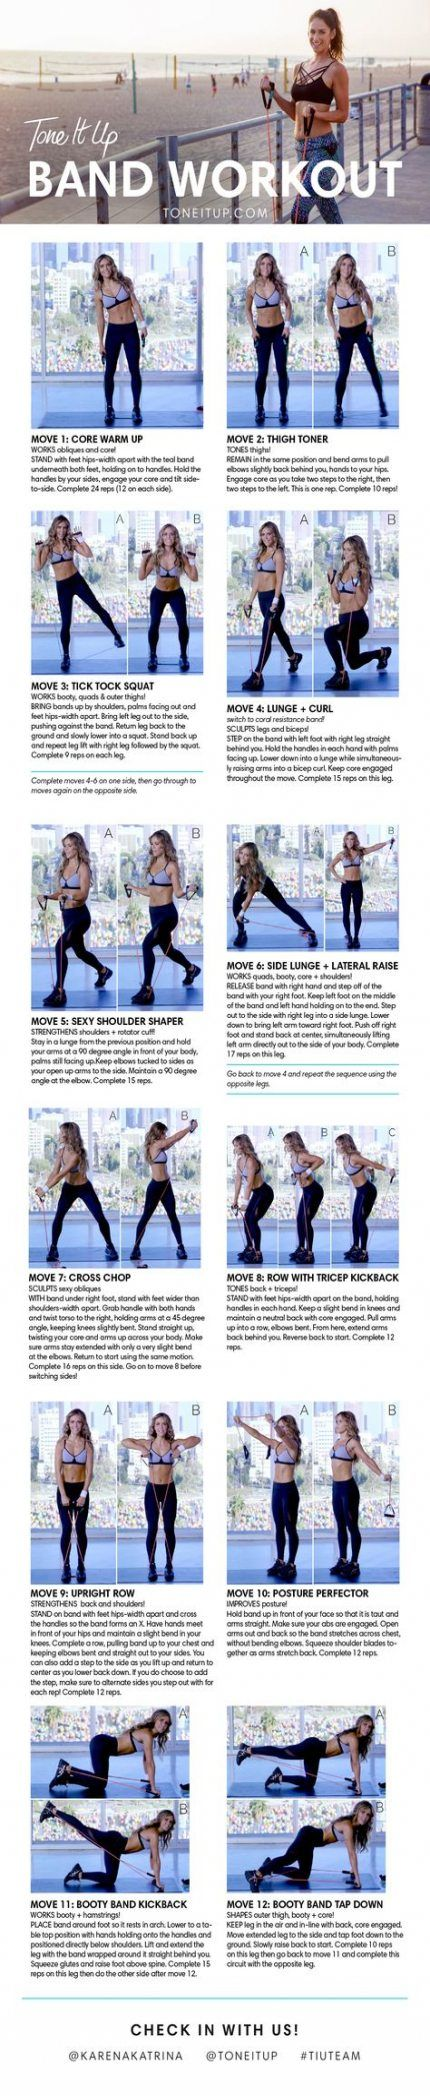 New Fitness Motivation Body Men Website 27 Ideas